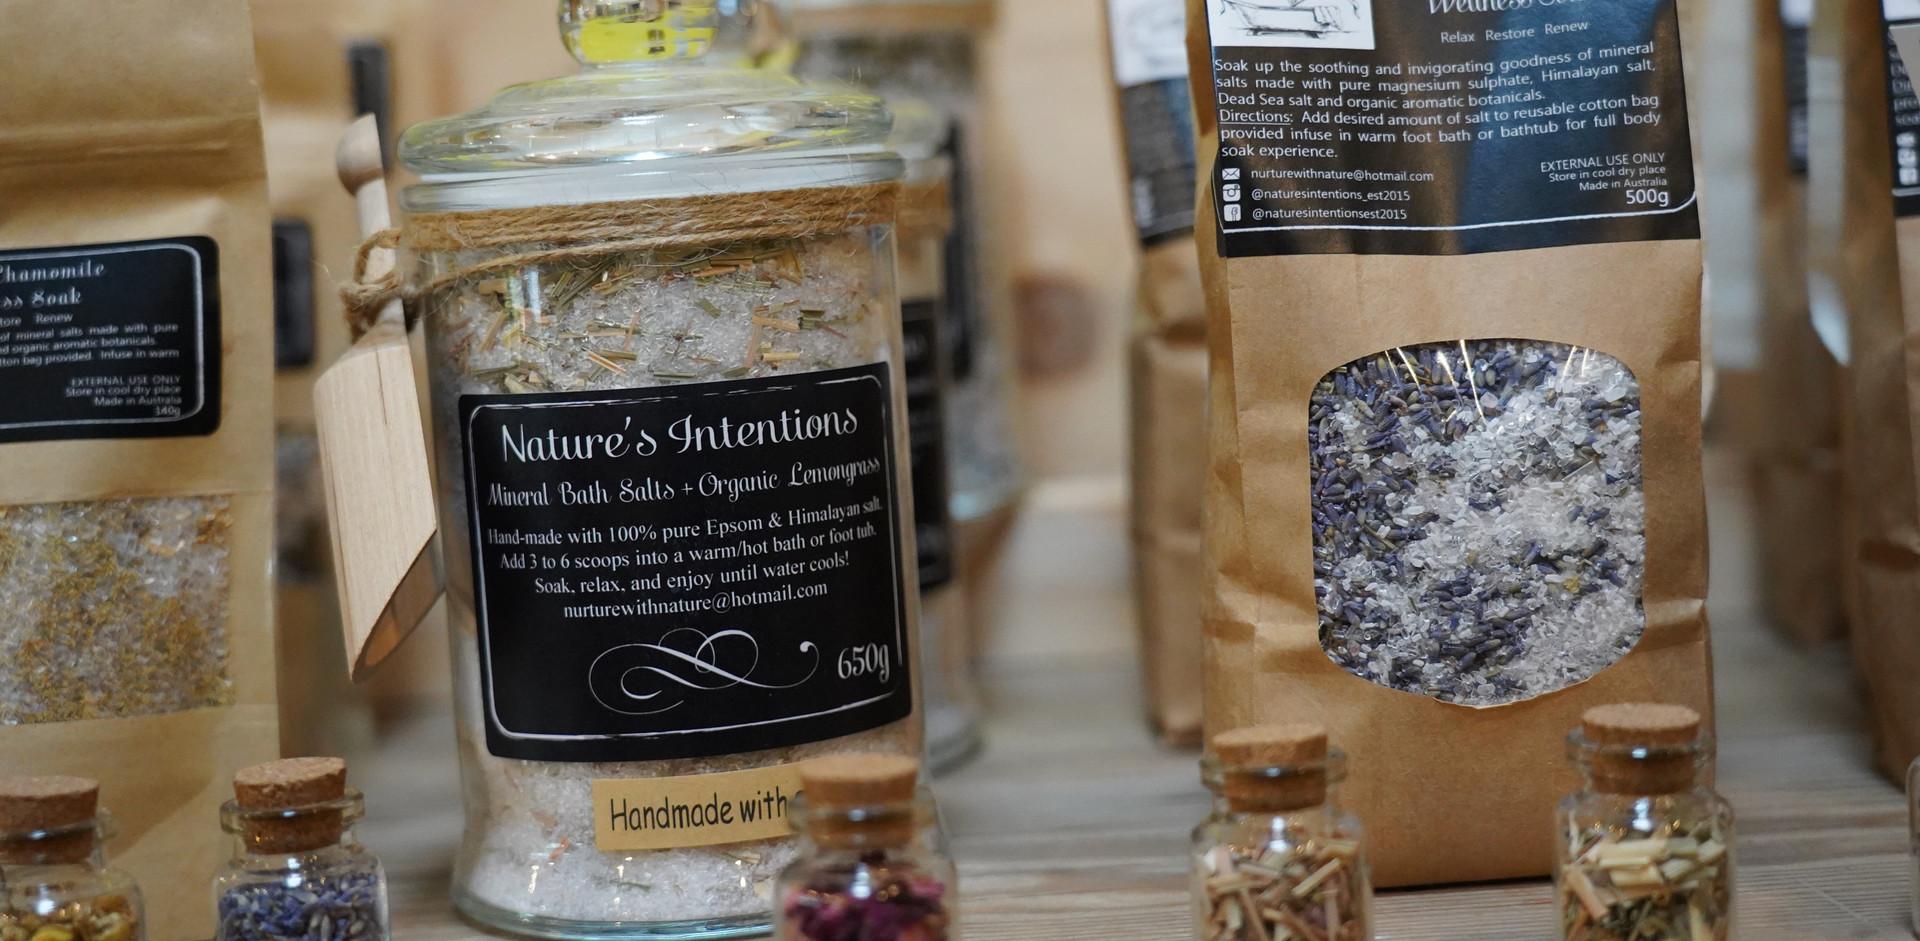 Nature's Intentions' bath salts